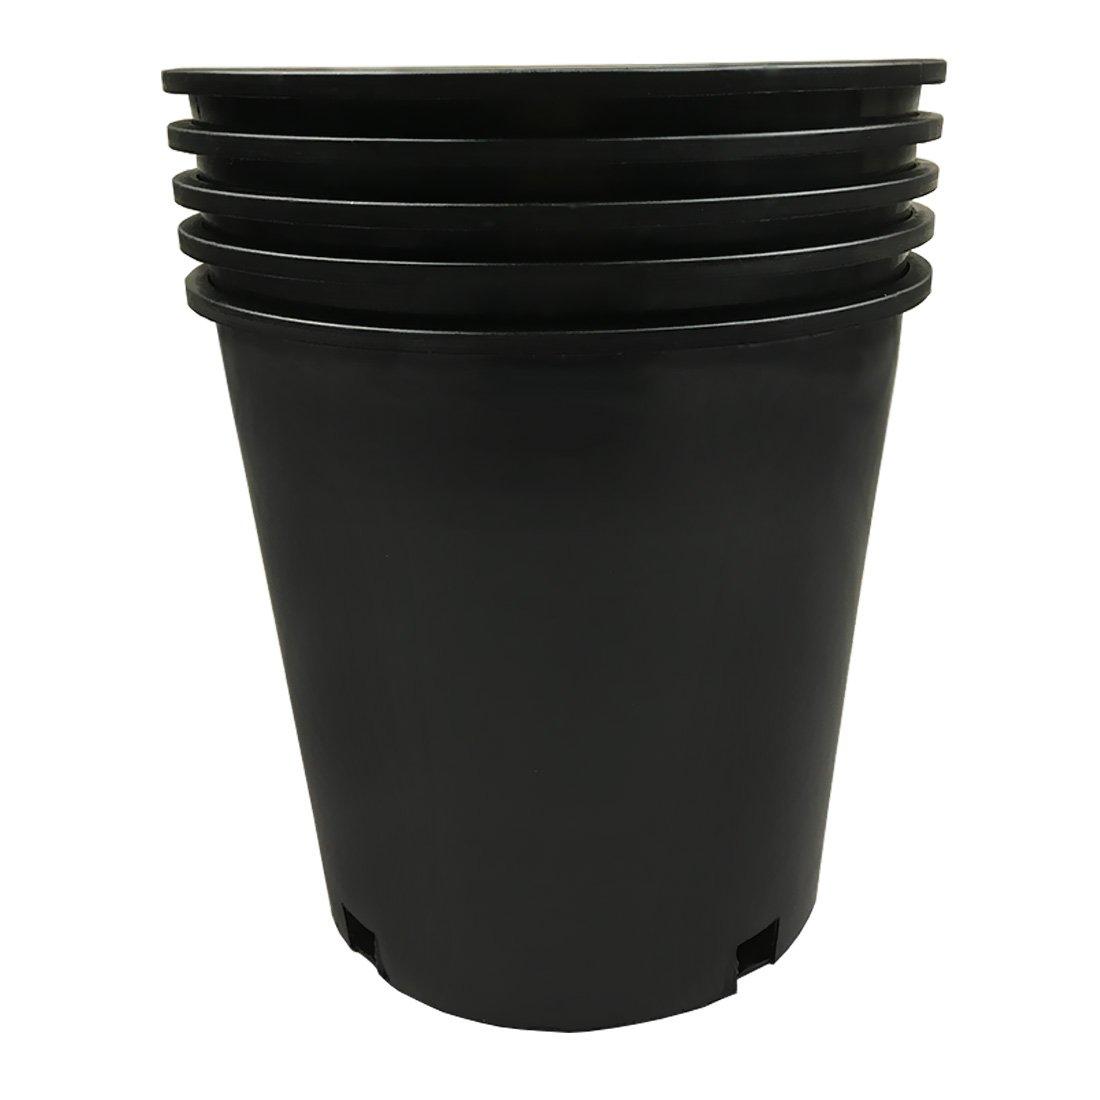 Calipots 5-Pack 2 Gallon Premium Black Plastic Nursery Plant Container Garden Planter Pots (2 Gallon)